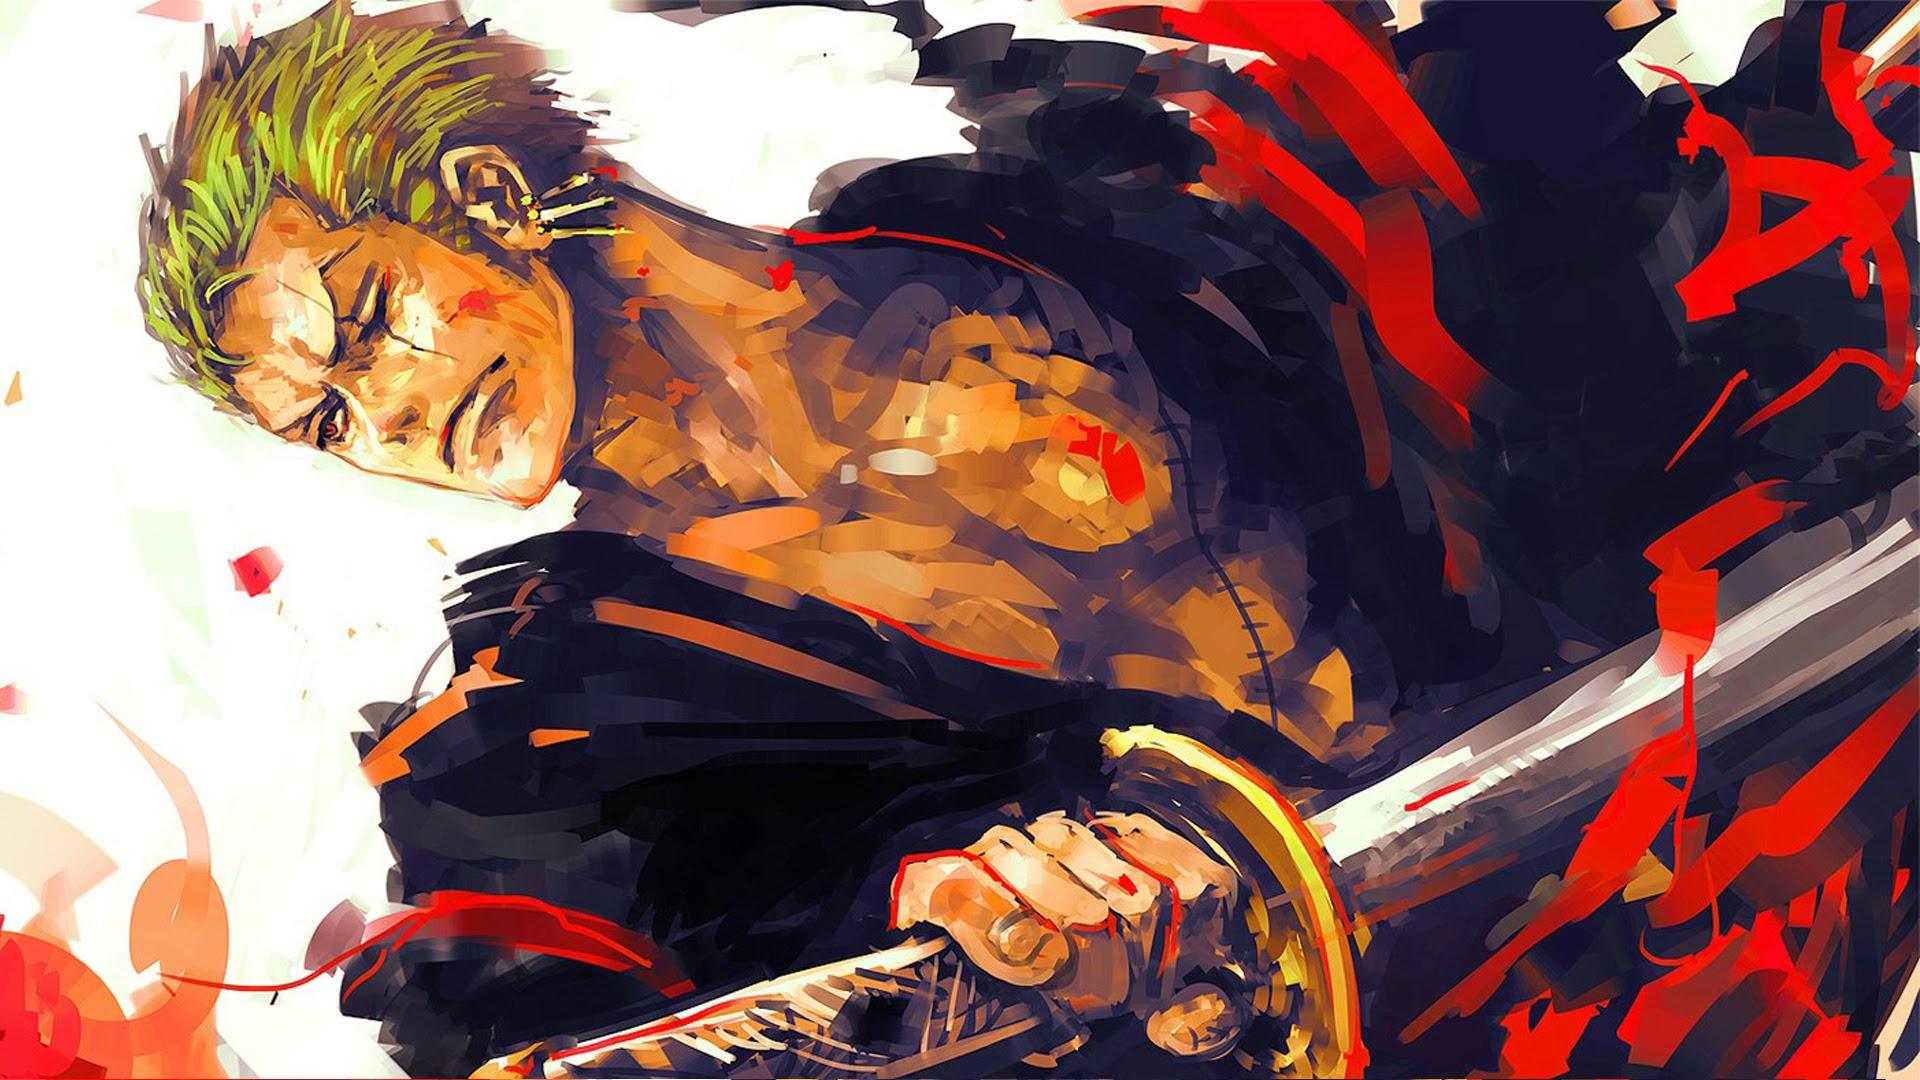 One Piece Zoro Wallpaper - WallpaperSafari